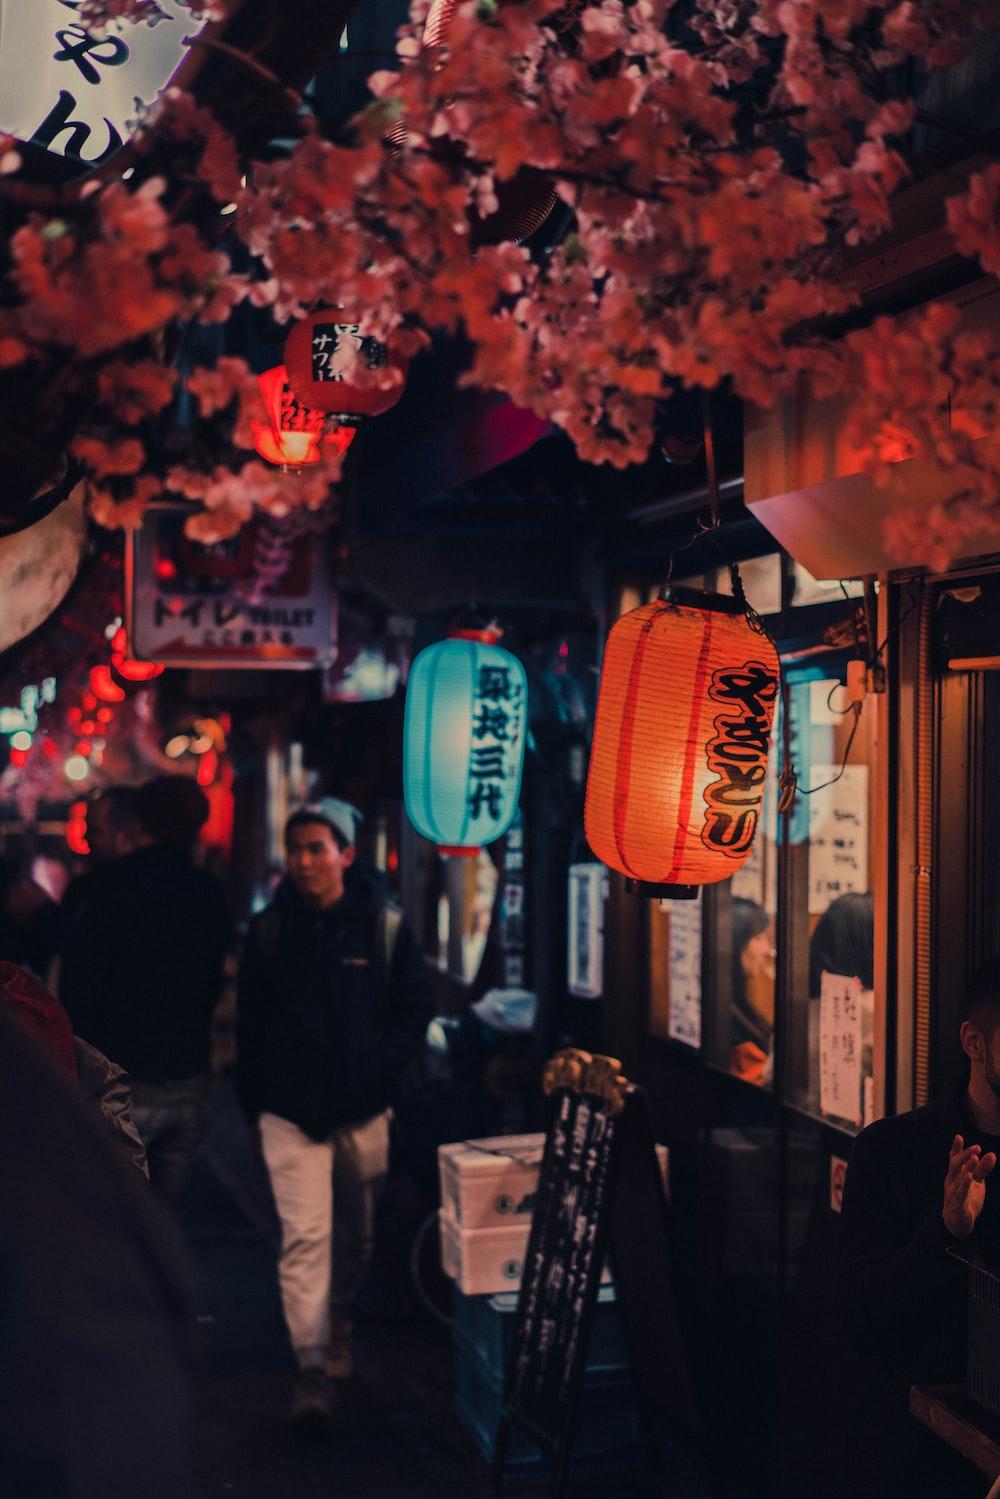 people standing near red paper lantern during nighttime